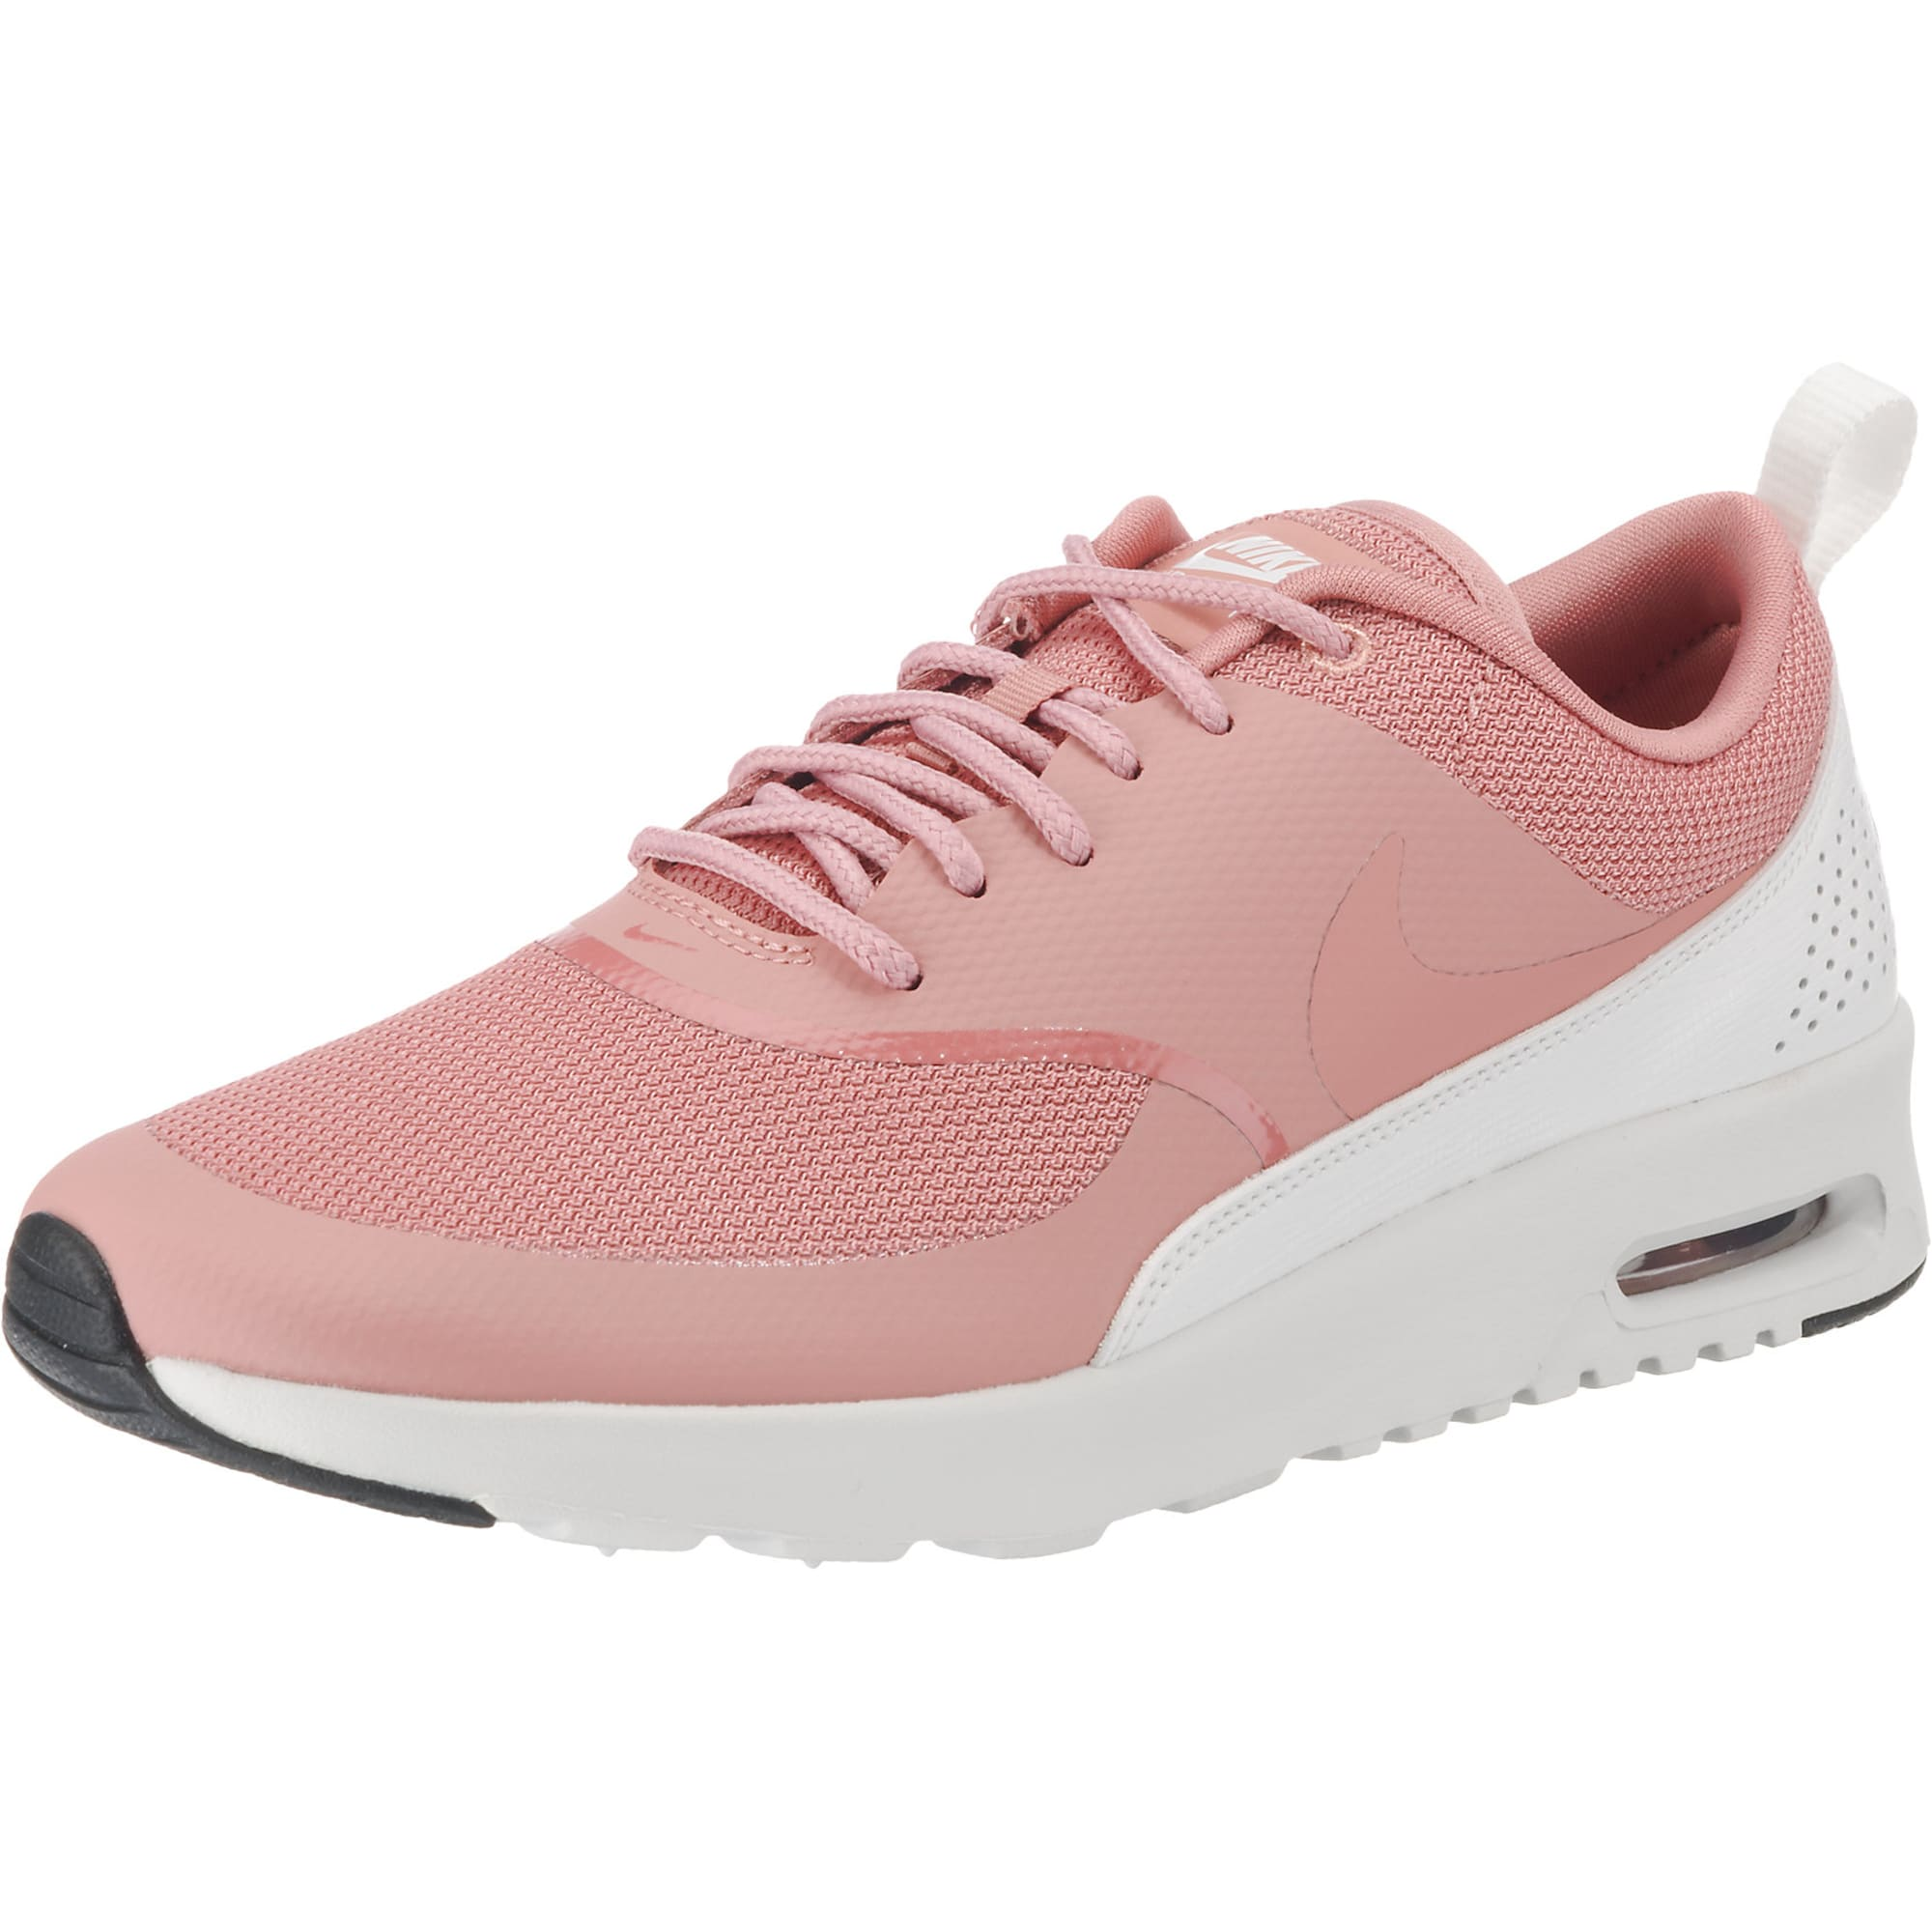 premium selection 60970 af61a nike Nike Sportswear Dames Sneakers Laag Air Max Thea Rose Wit nike kopen  in de aanbieding